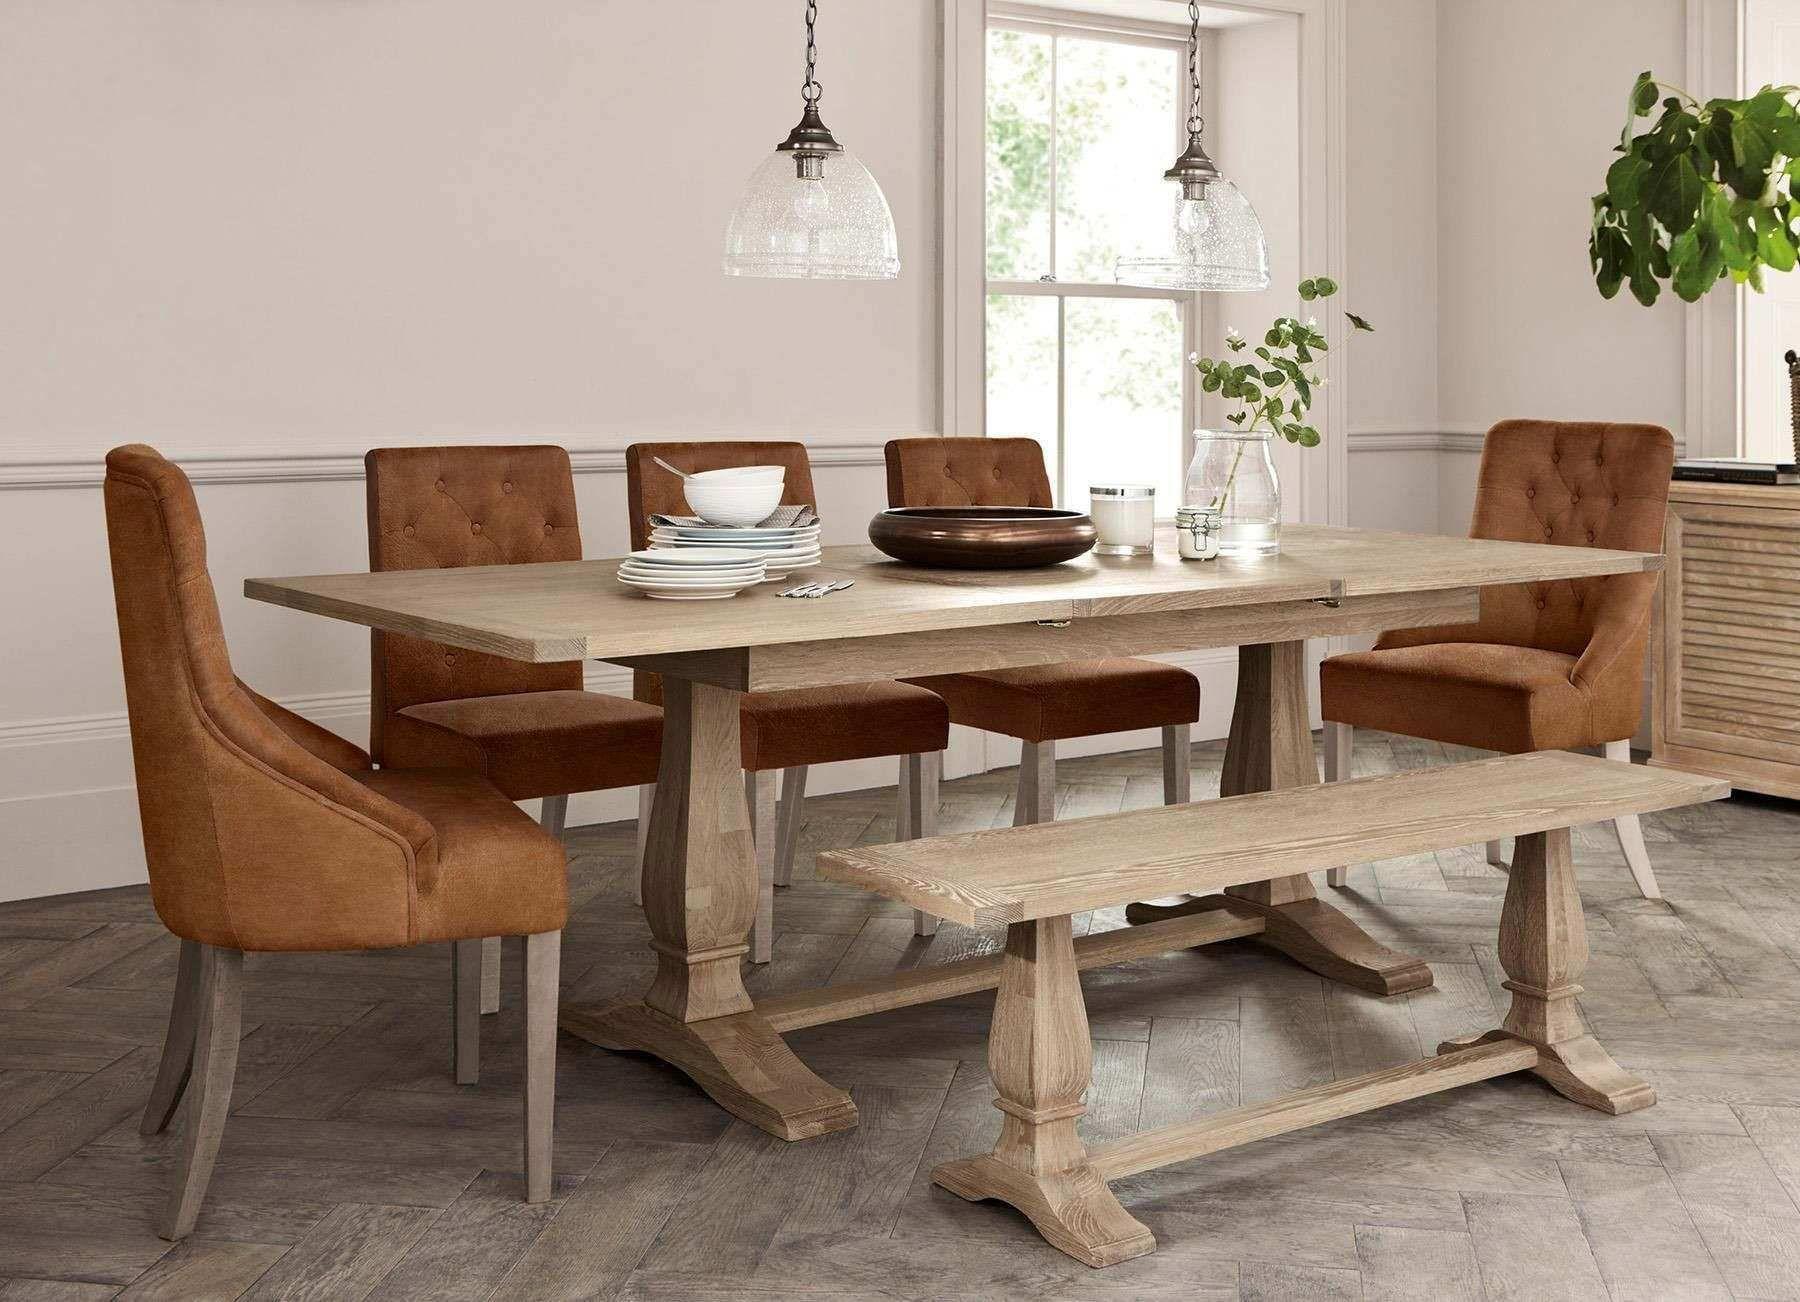 Dining Room Sets for Sale Near Me   Meja makan bulat, Furnitur ...